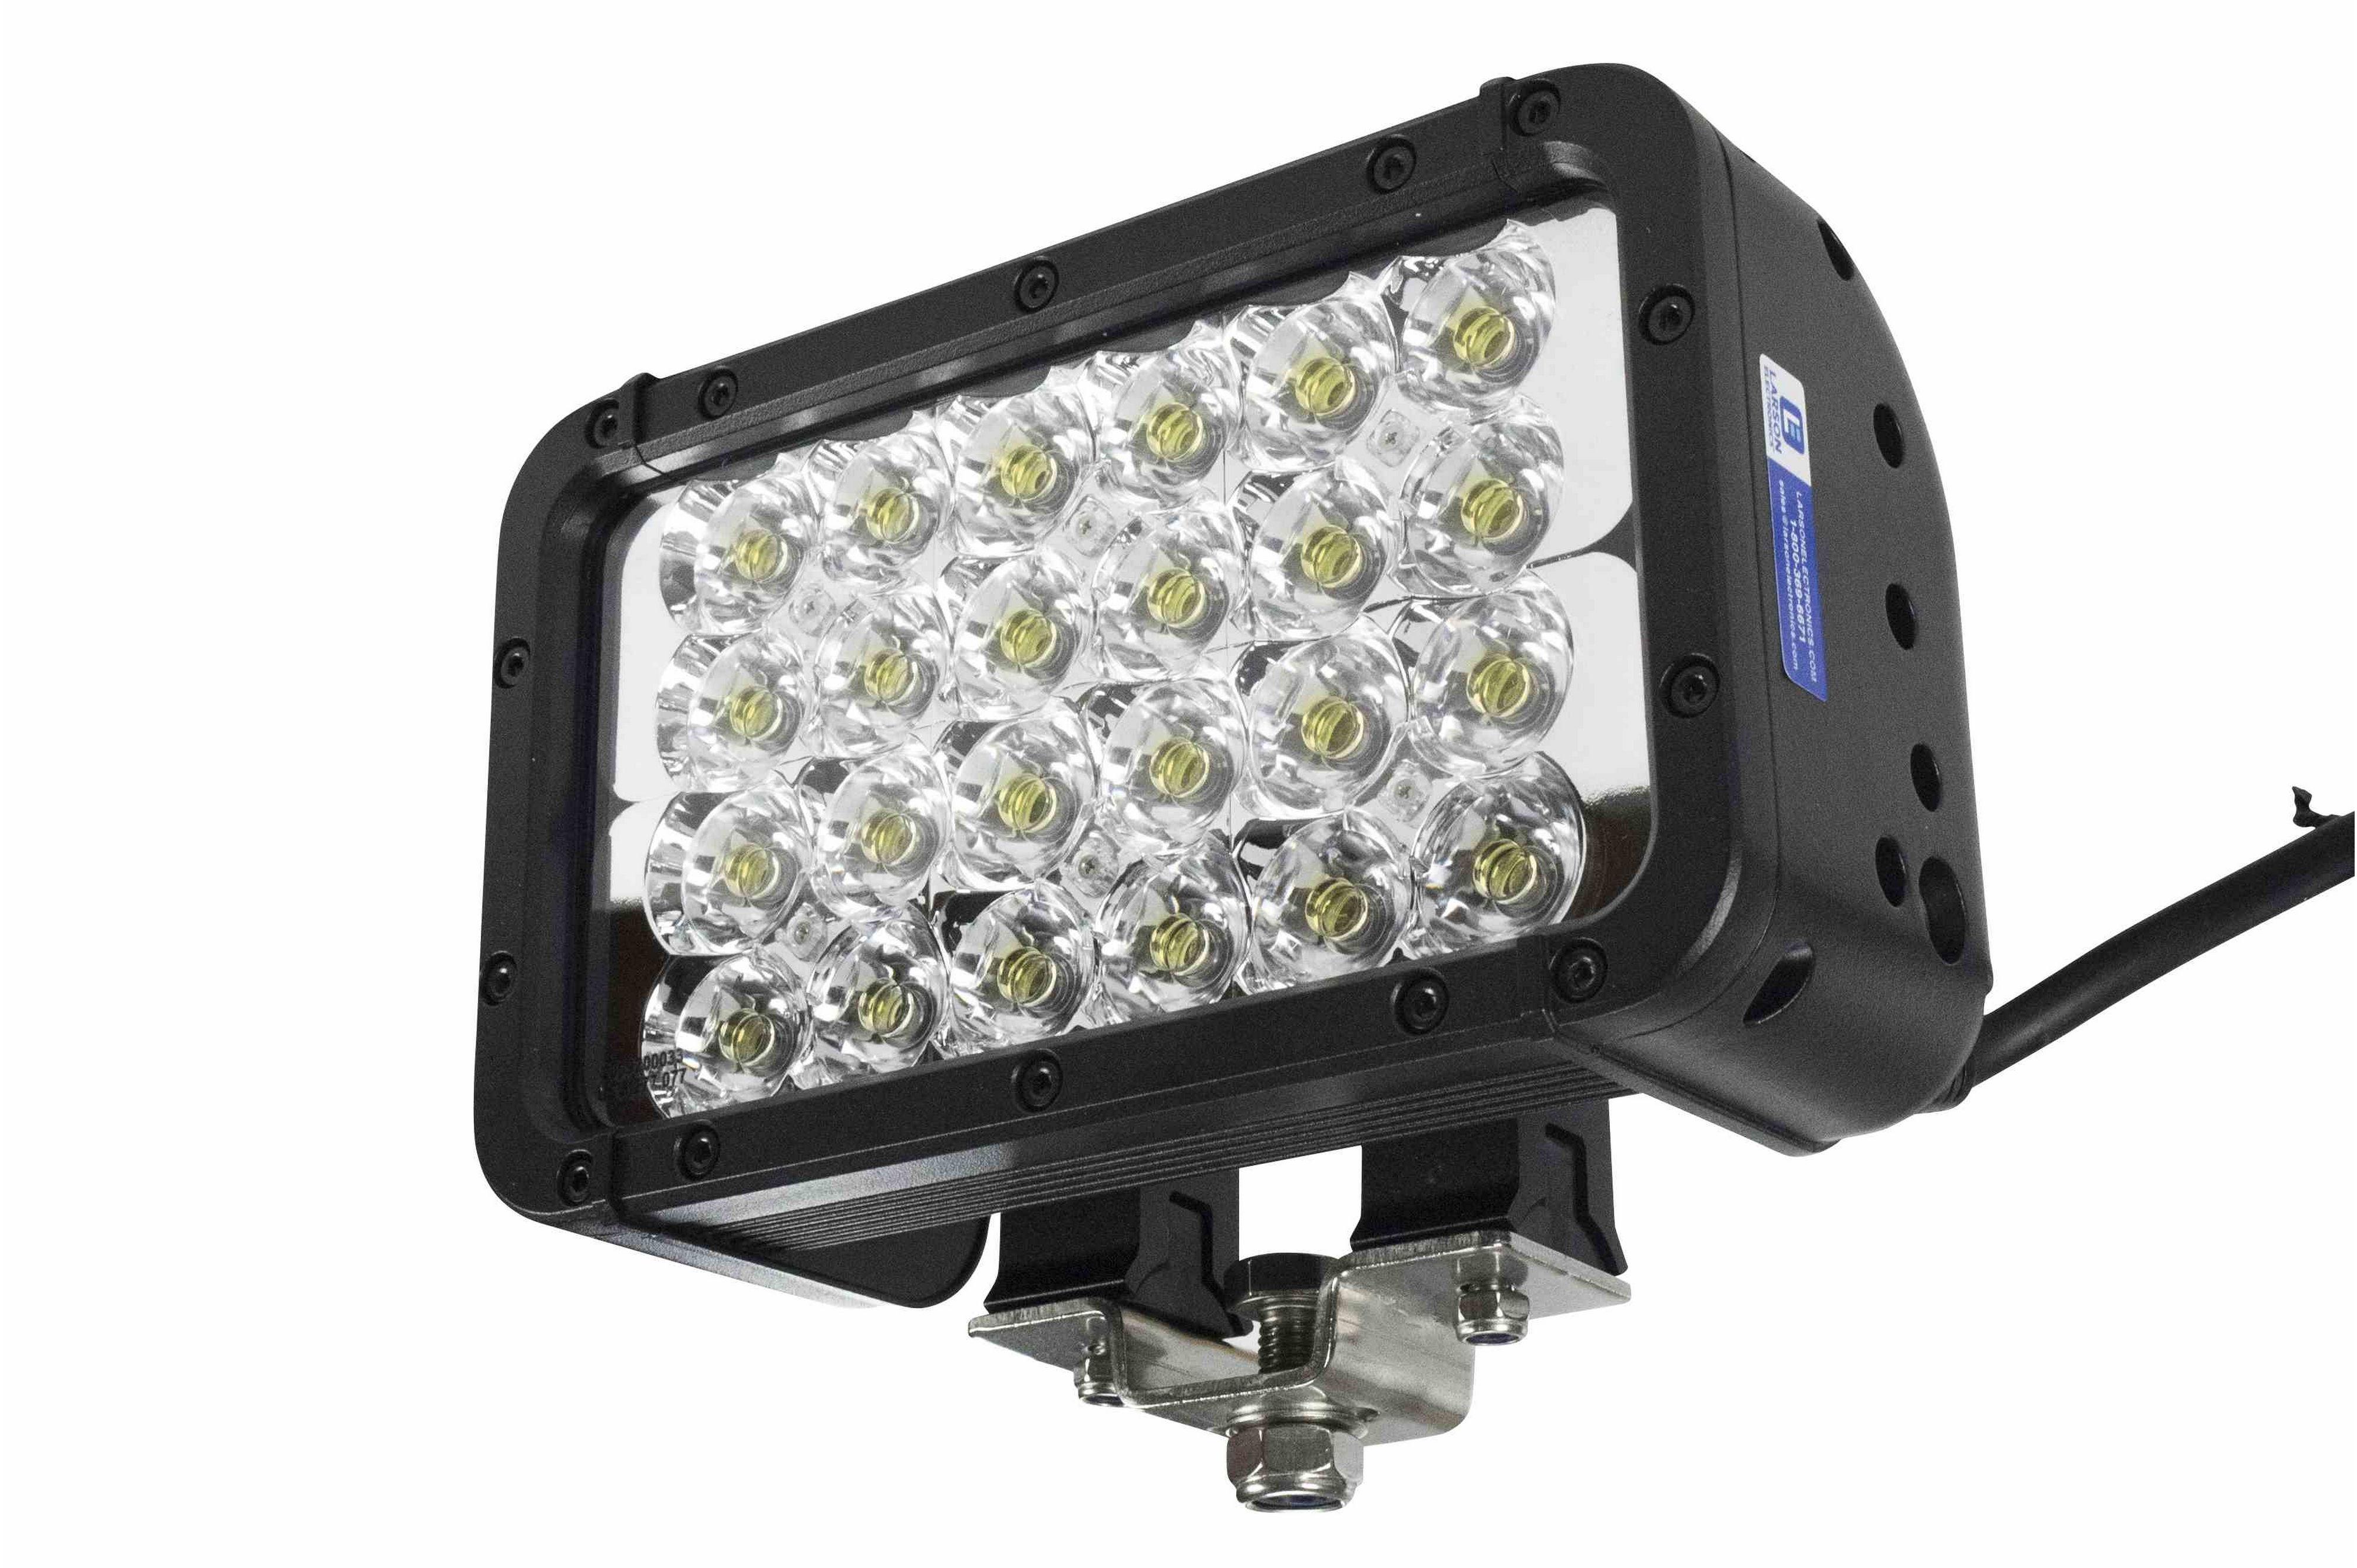 Led Ir Emitter Light 24 Leds 72 Watts 900l X 100w Beam 9 Temporary Lamp Illuminator Hi Res Image 3 Angle